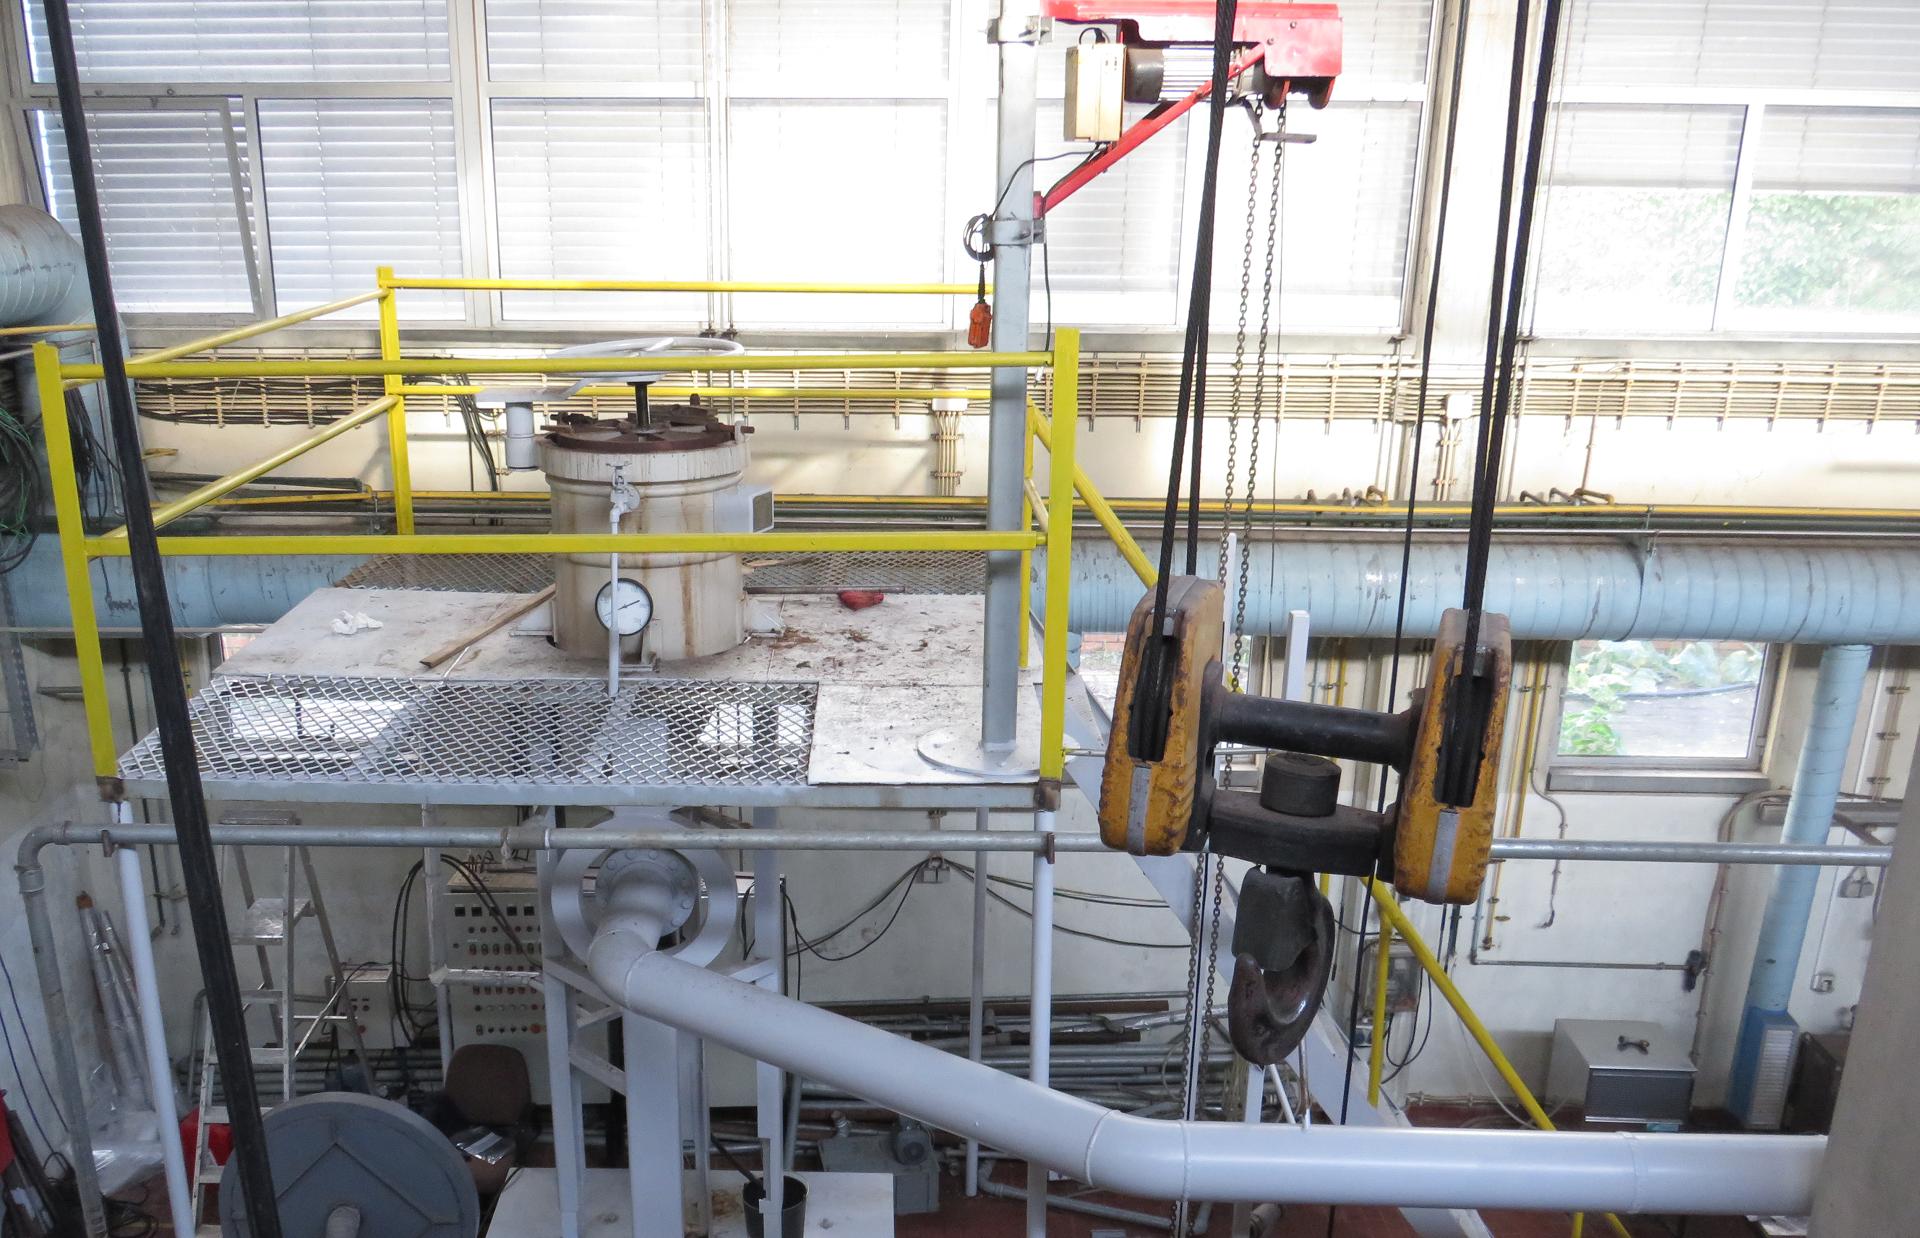 palestra-main-challenges-and-achievements-on-lignocellulosic-based-etanol-biorefineries